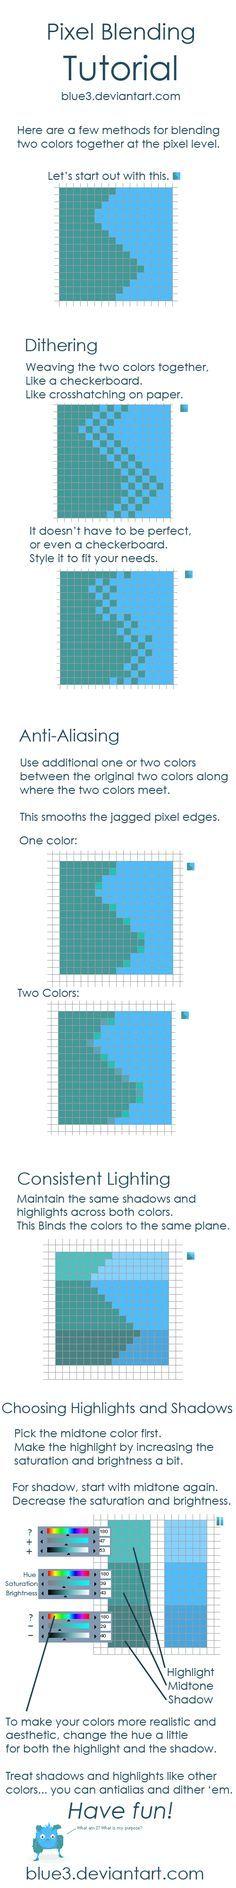 Pixel Blending + Shading Tips by BluE3.deviantart.com on @deviantART